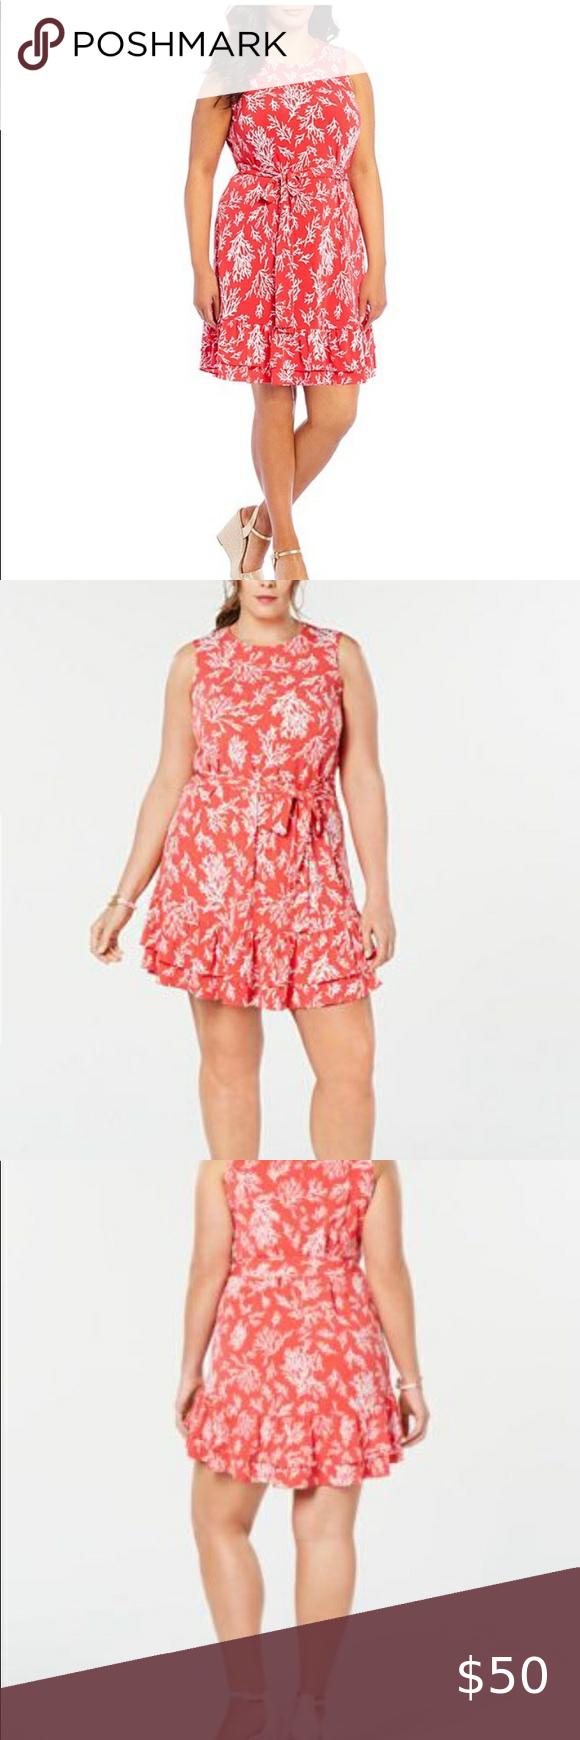 Michael Kors Reef Print Ruffle Dress Size 2x Beautiful Summer Dresses Ruffle Dress Stretchy Dress [ 1740 x 580 Pixel ]